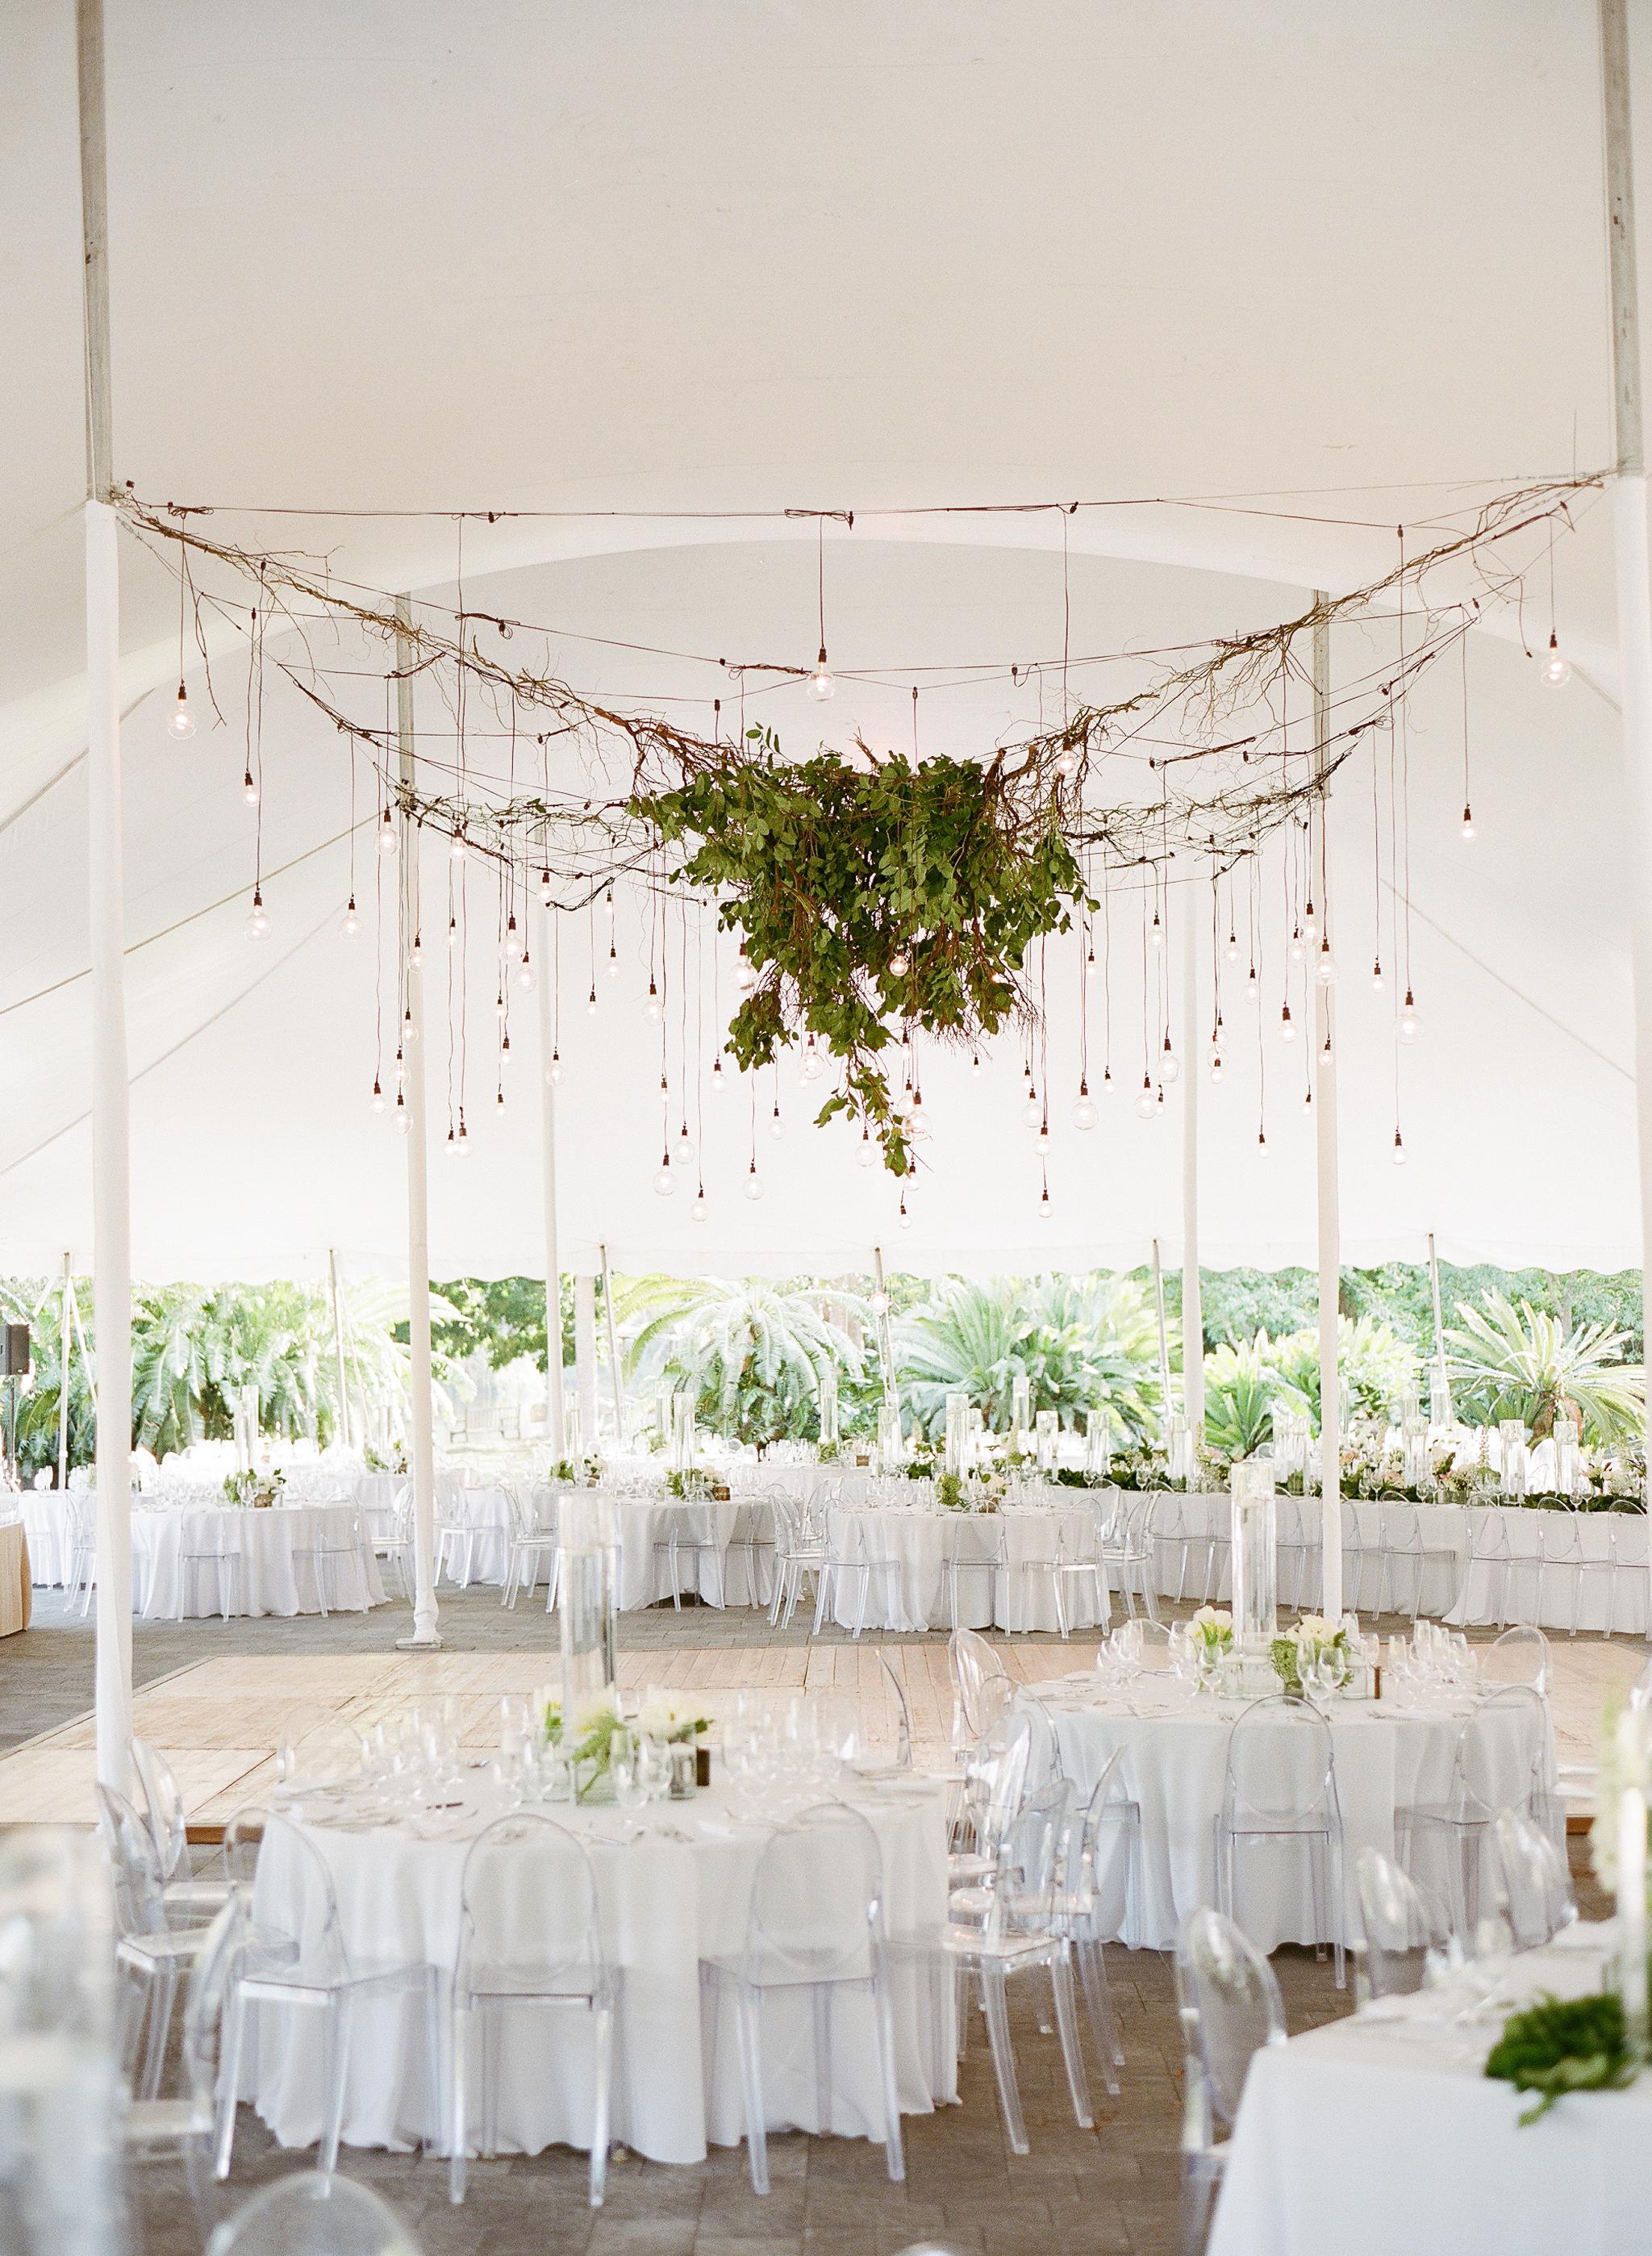 Fairchild Tropical Botanic Garden Wedding Private Rentals